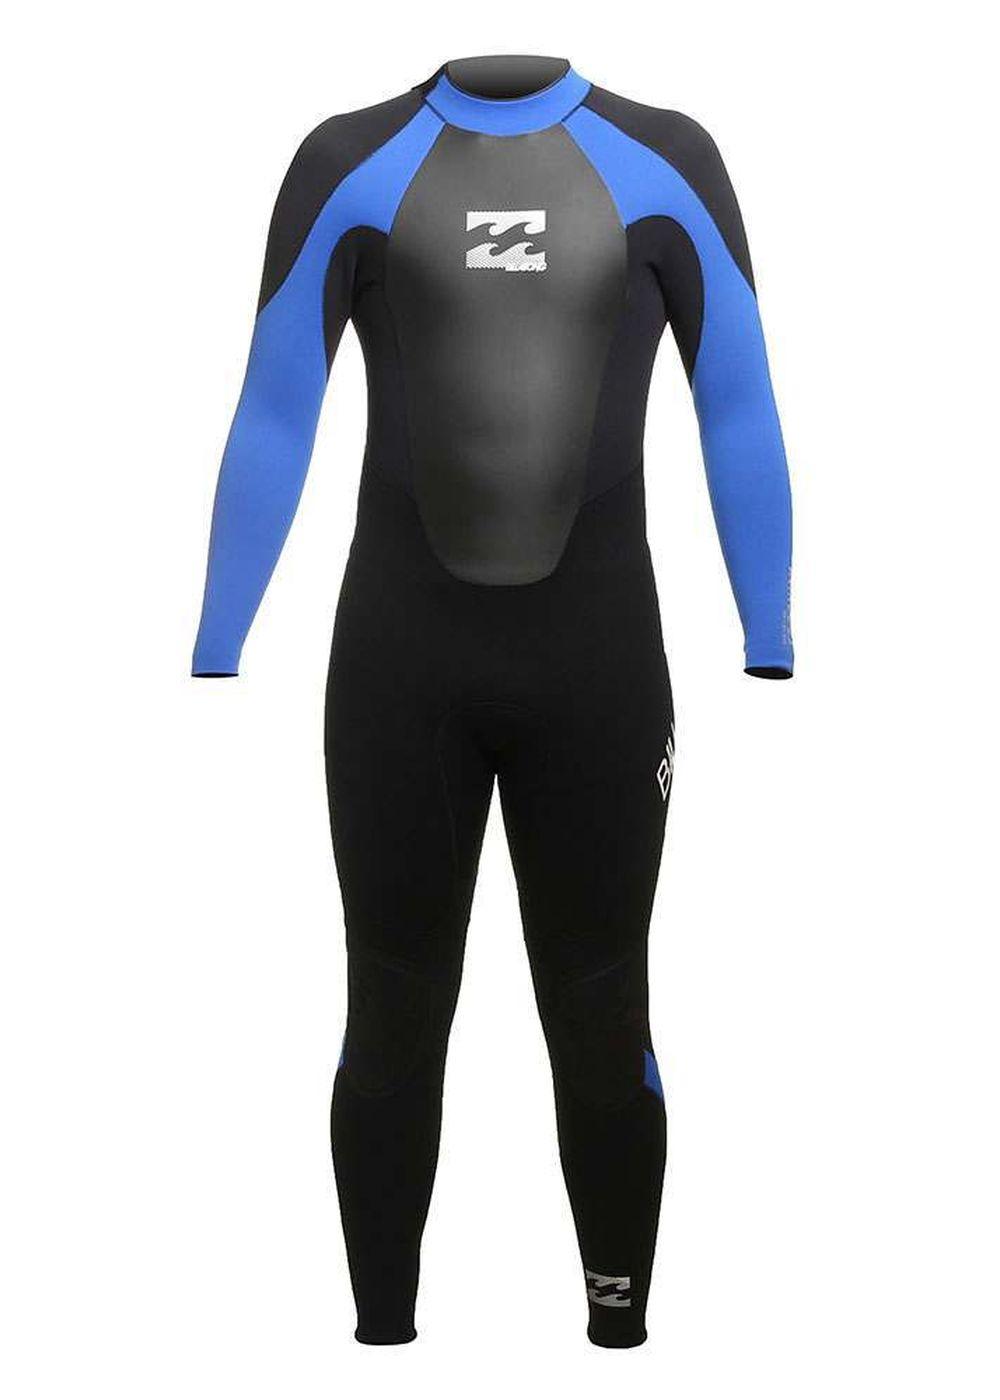 Billabong Intruder Bz 5/4 Wetsuit 2018 Blue Picture